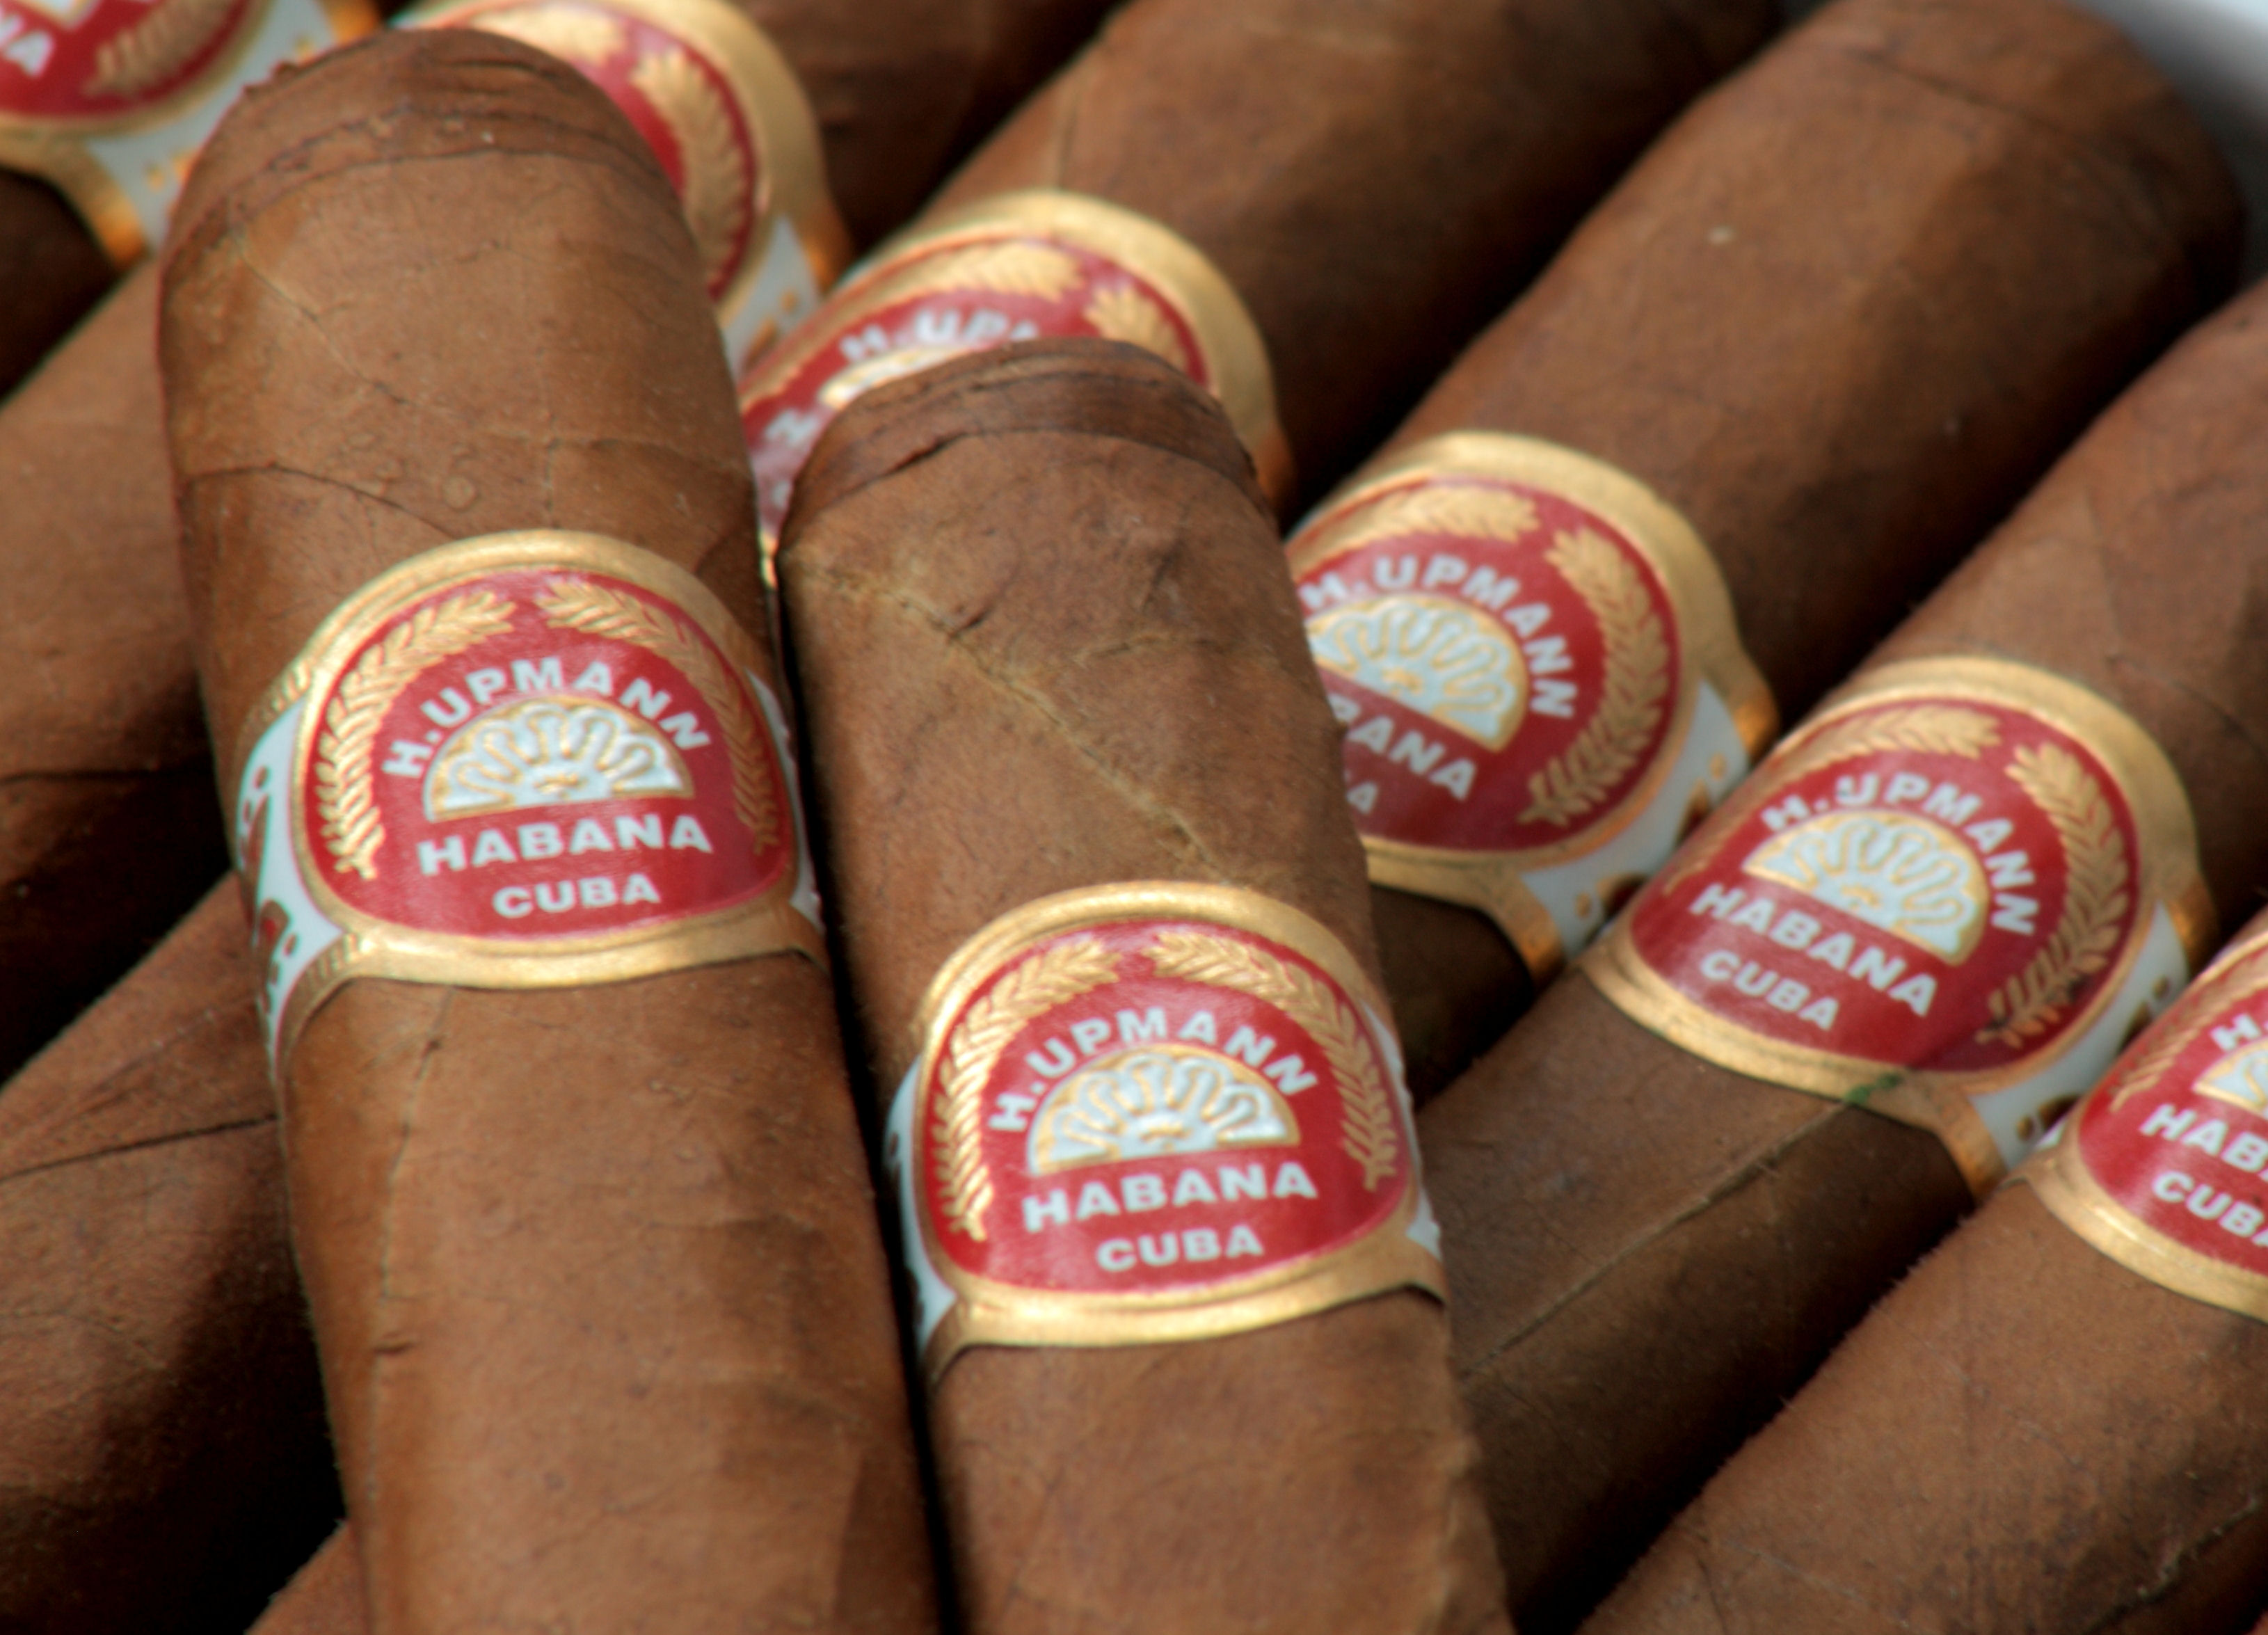 Cigars photo